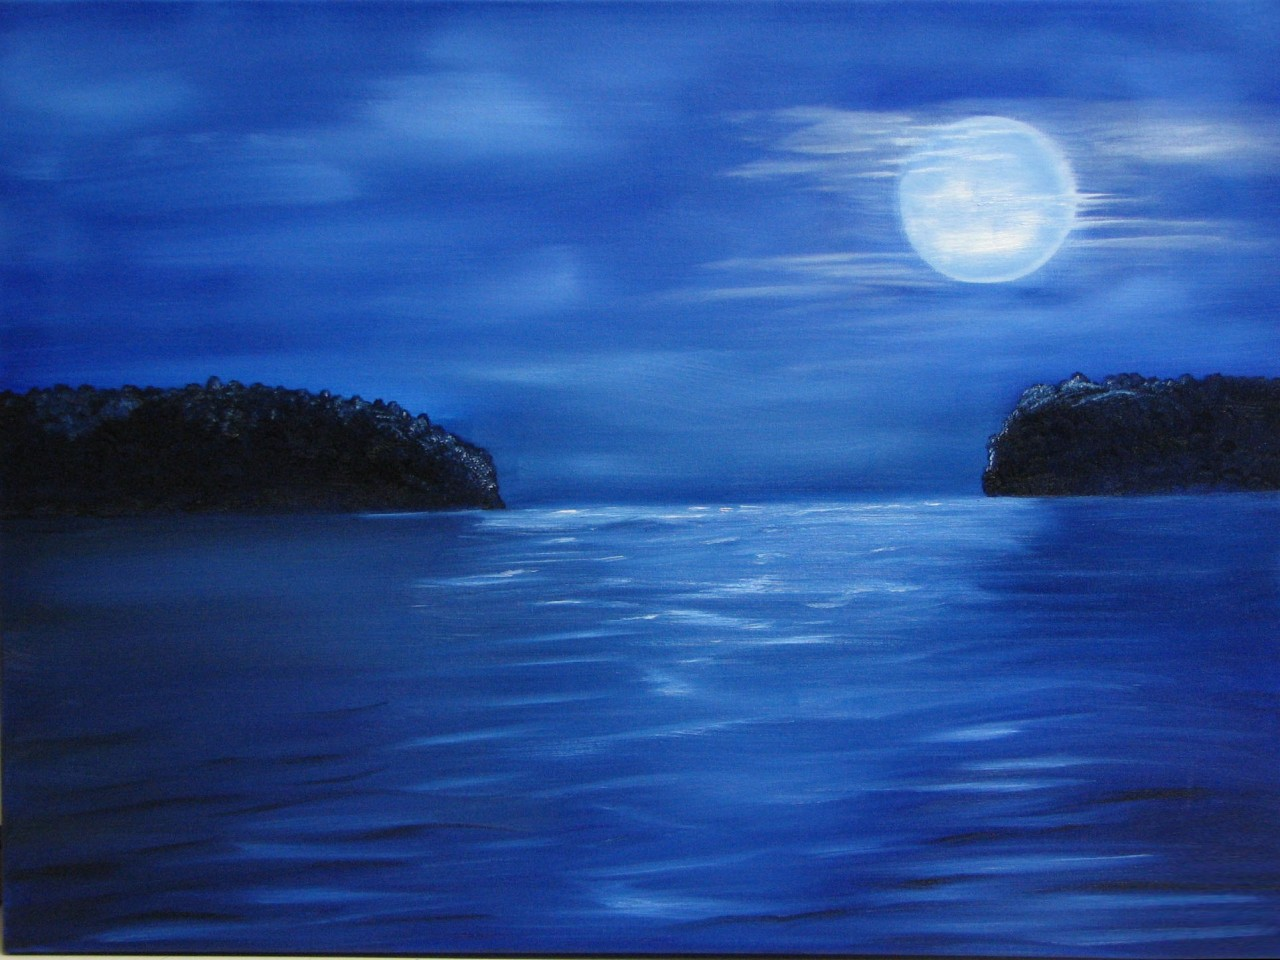 BLUE MOON OVER OCEAN wallpaper   ForWallpapercom 1280x960